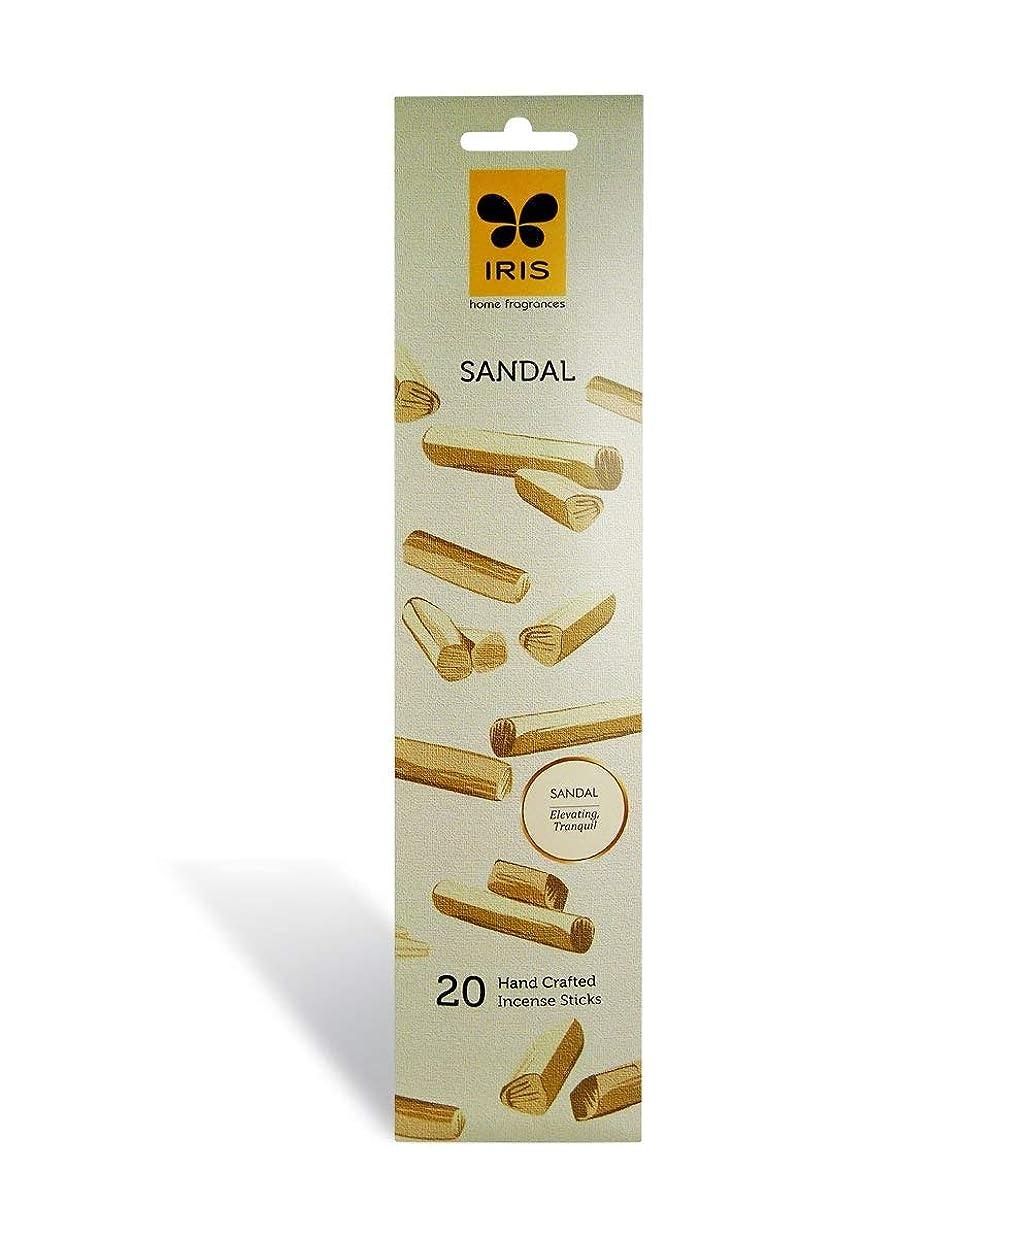 IRIS Signature Sandal Fragrance Incense Sticks